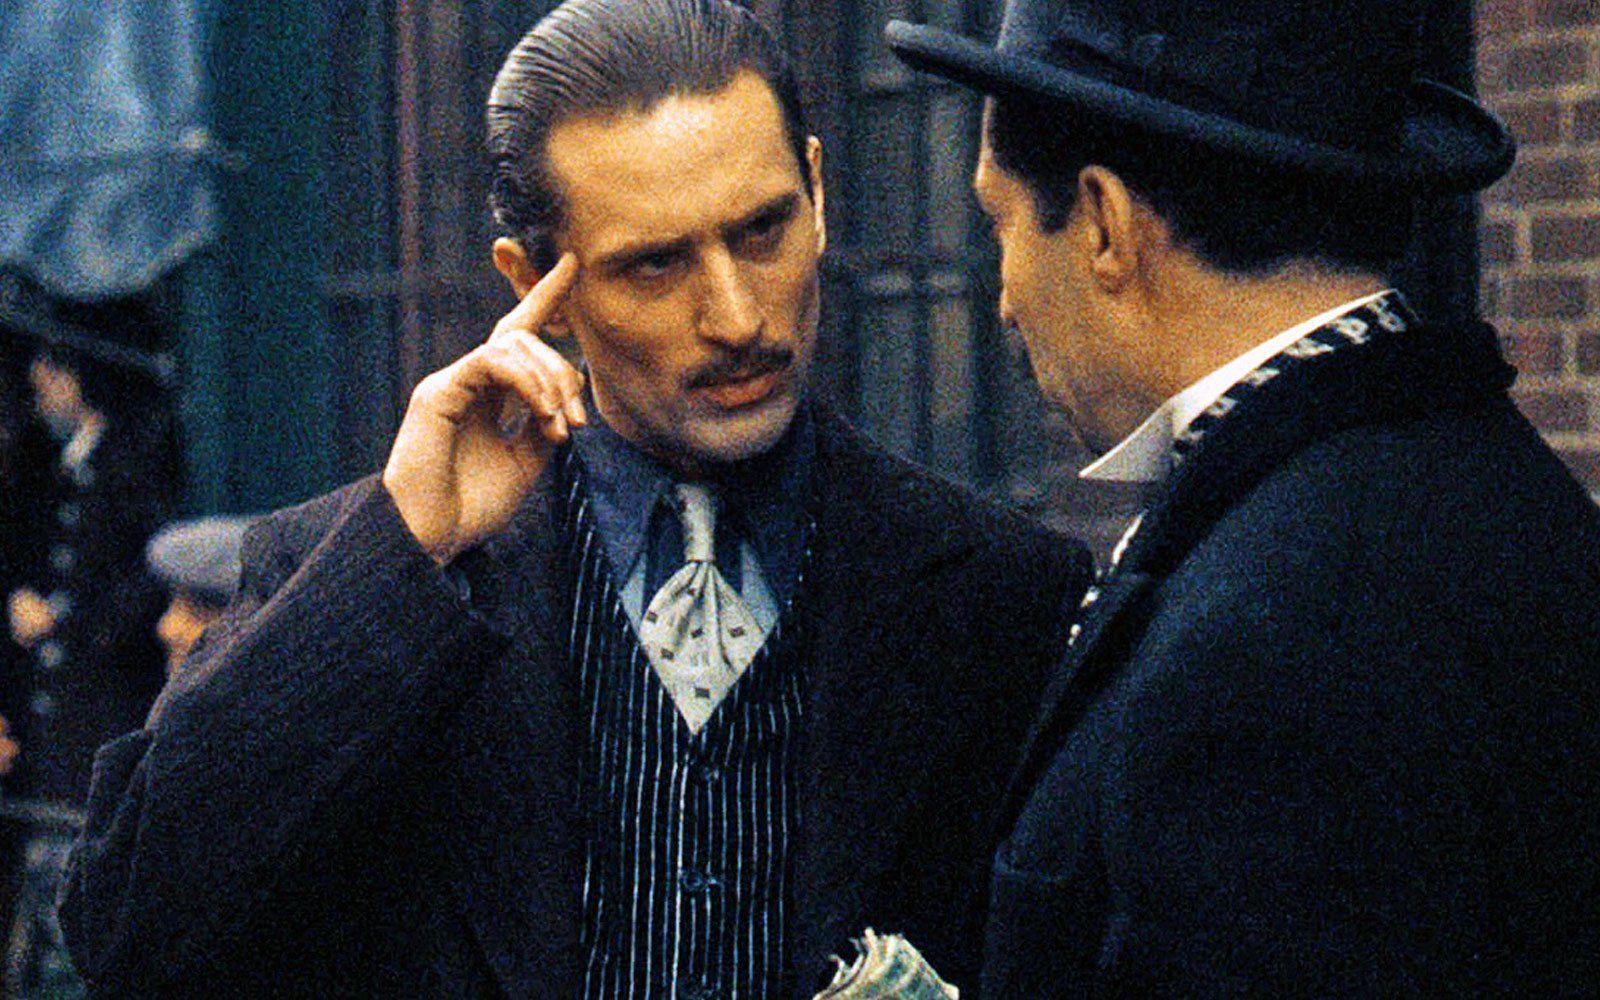 Robert De Niro | Godfather movie, Iconic movies, The godfather